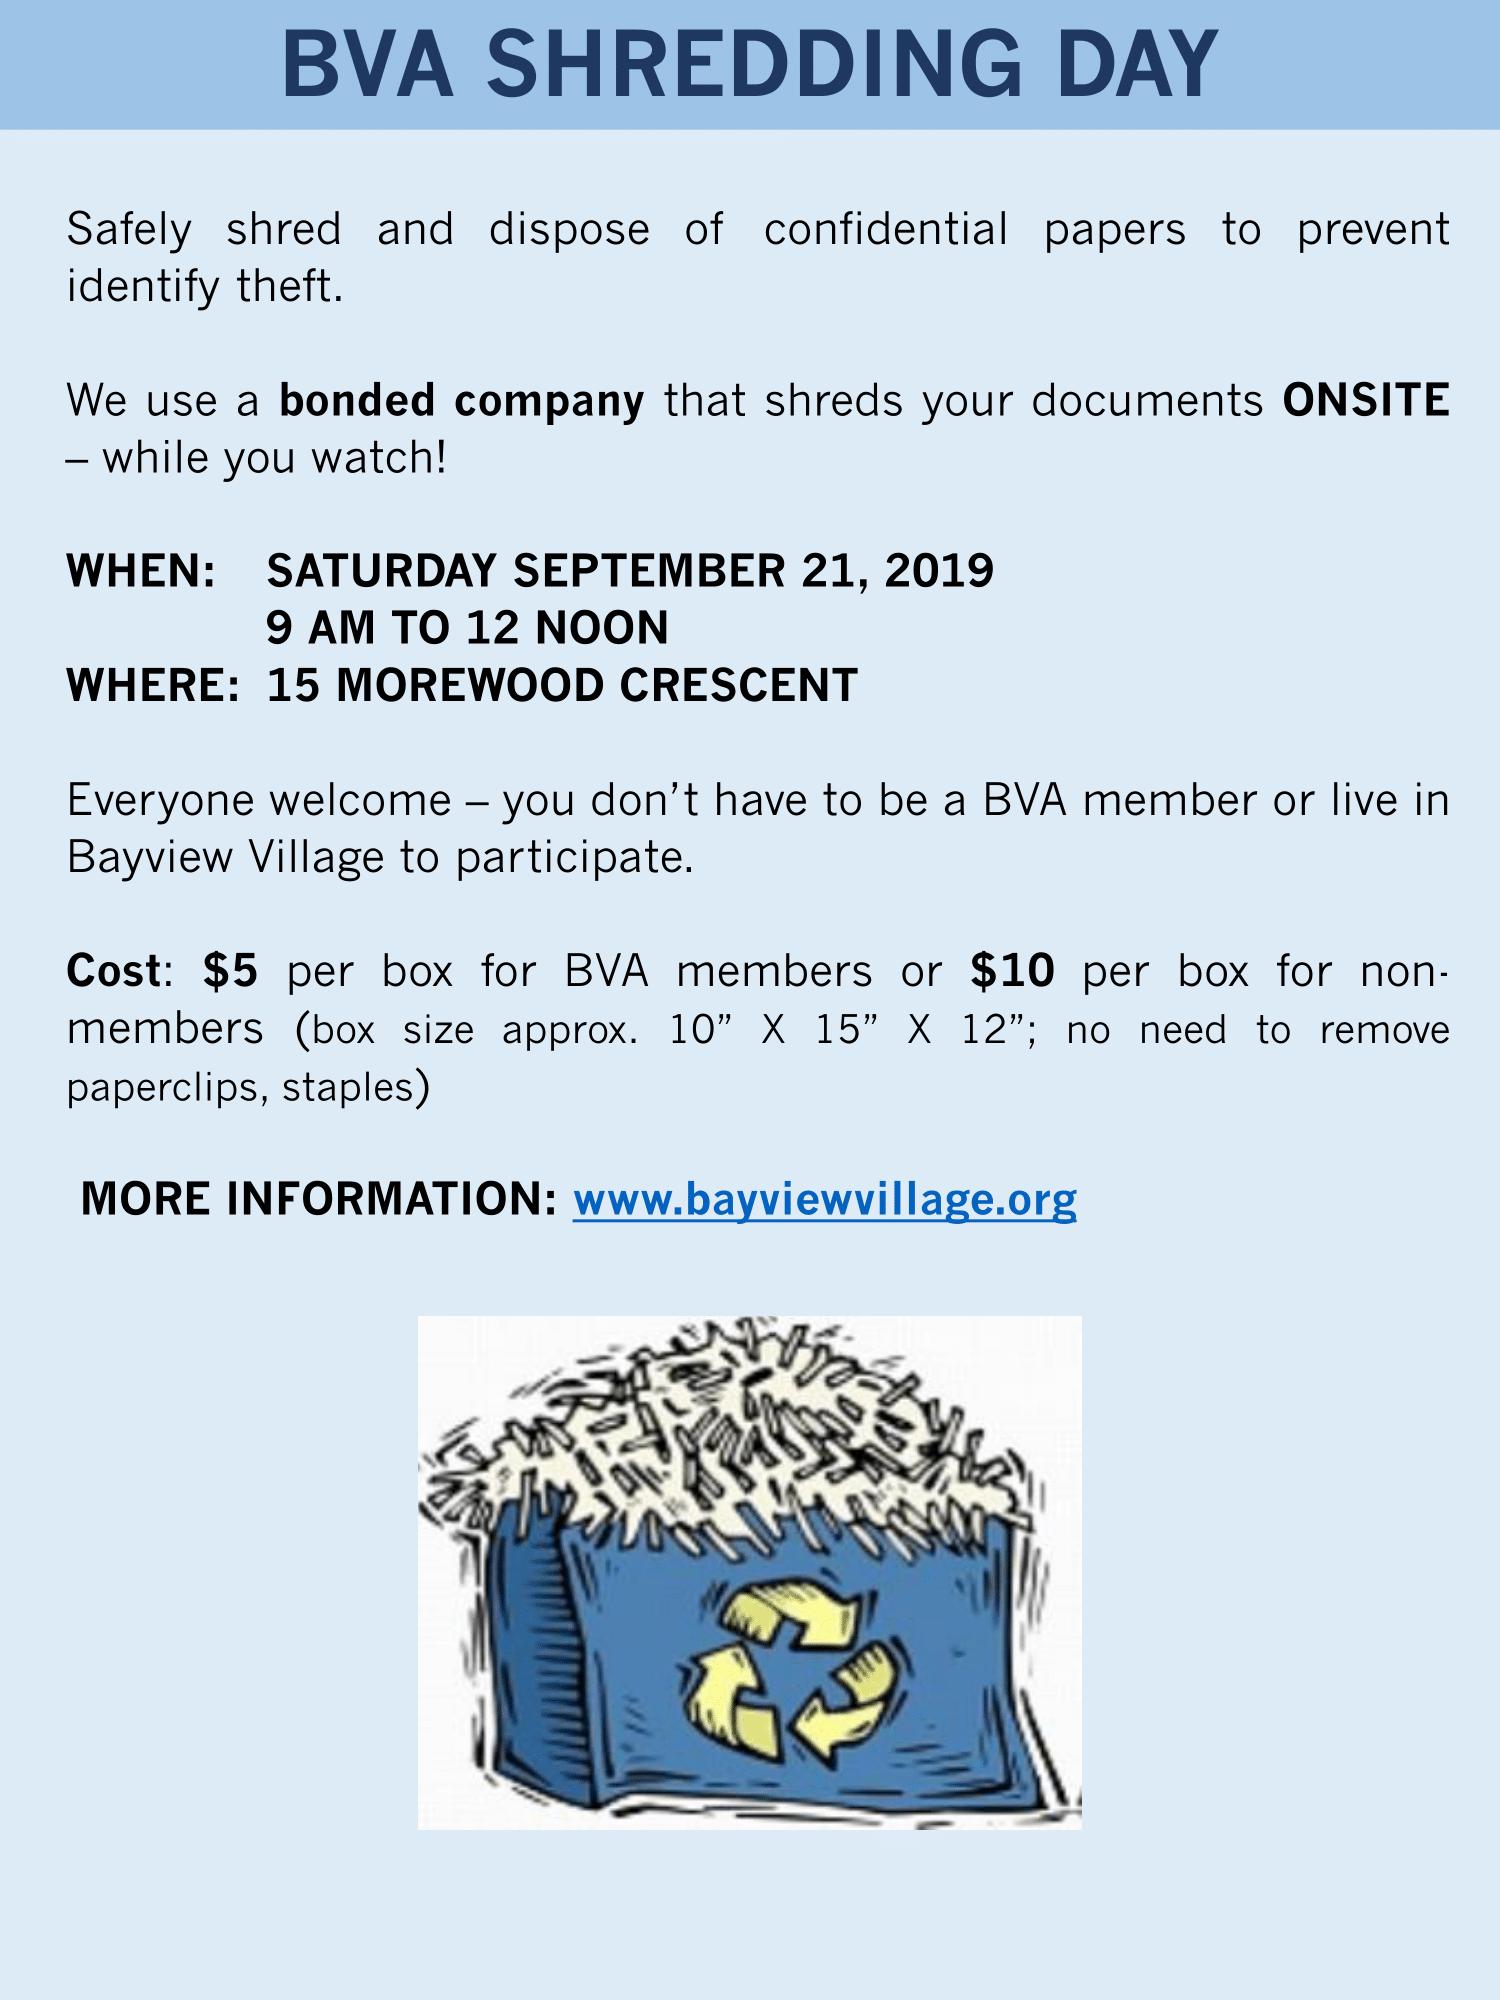 BVA shredding day 2019-1.png